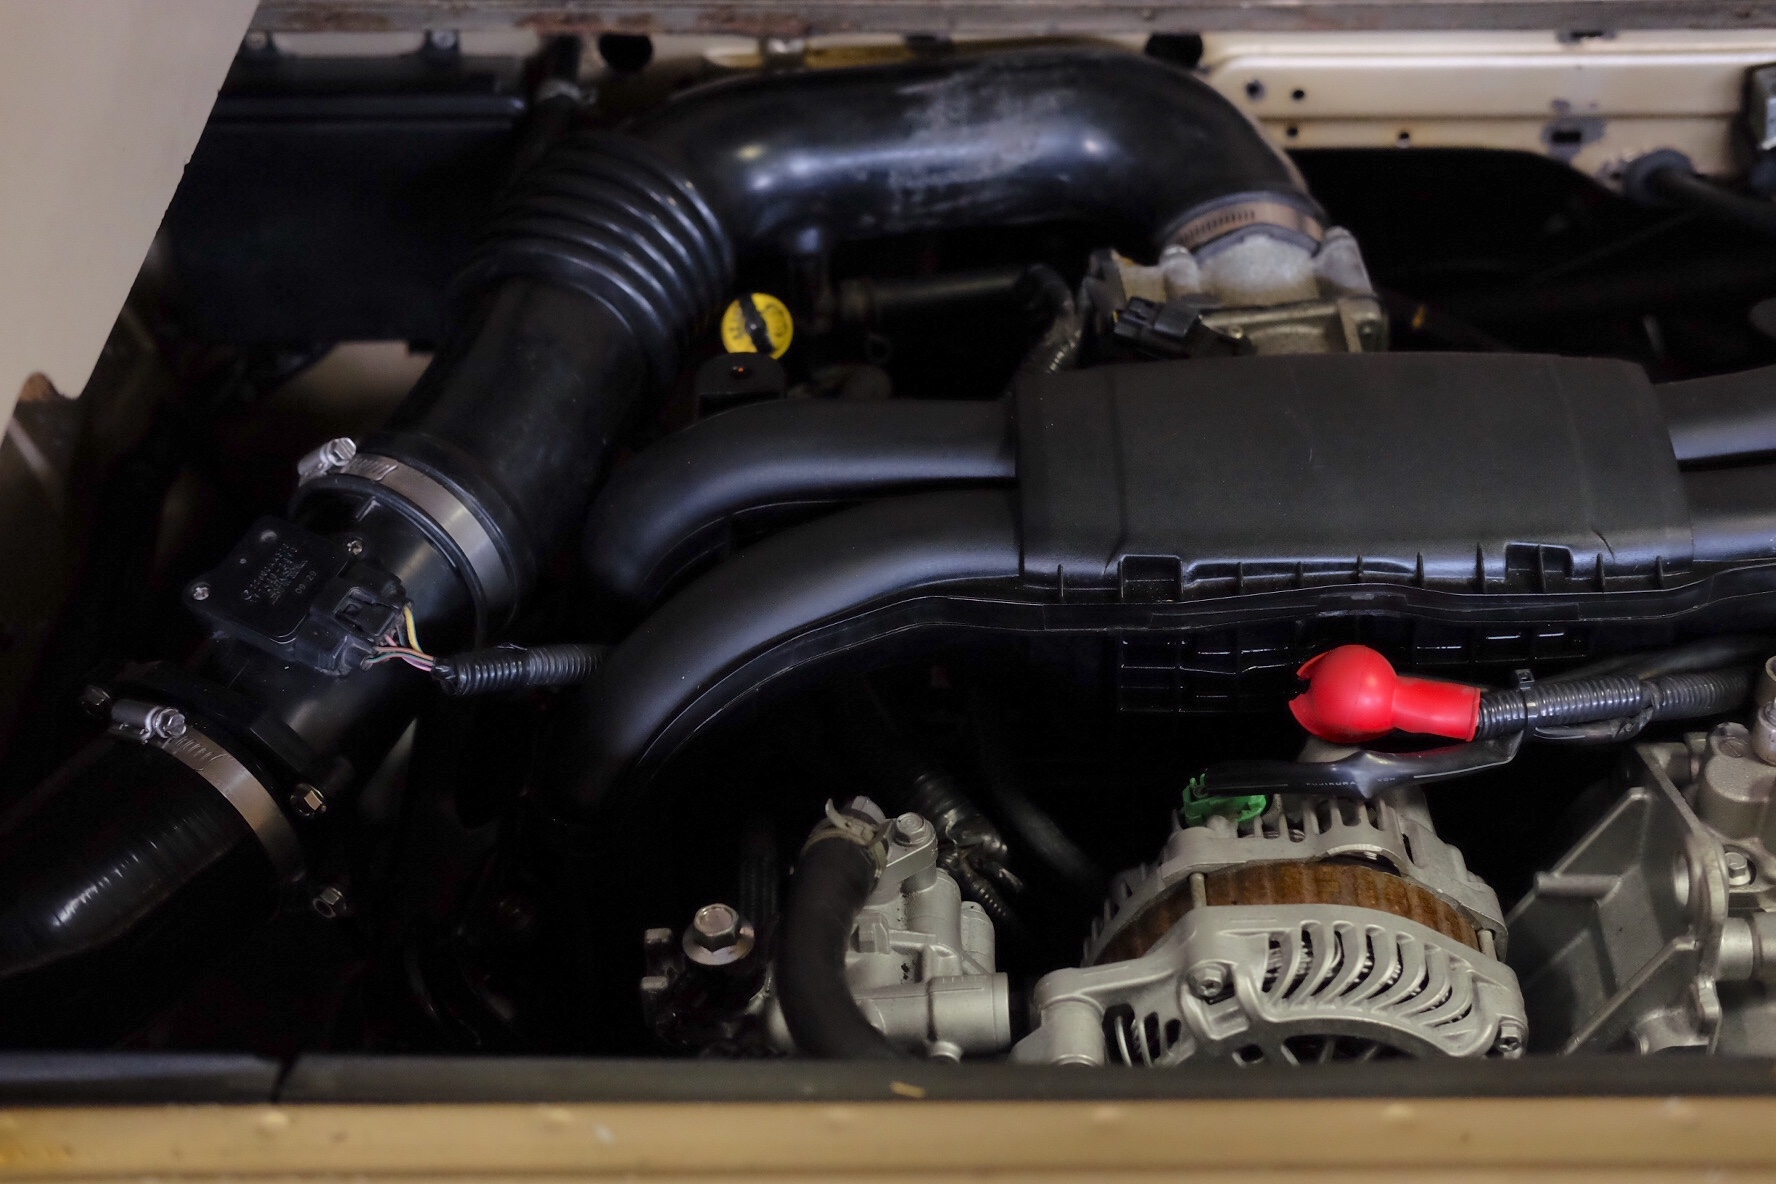 2012 Subaru Legacy EJ25 with Vanaru intake assembly leading to custom air-box